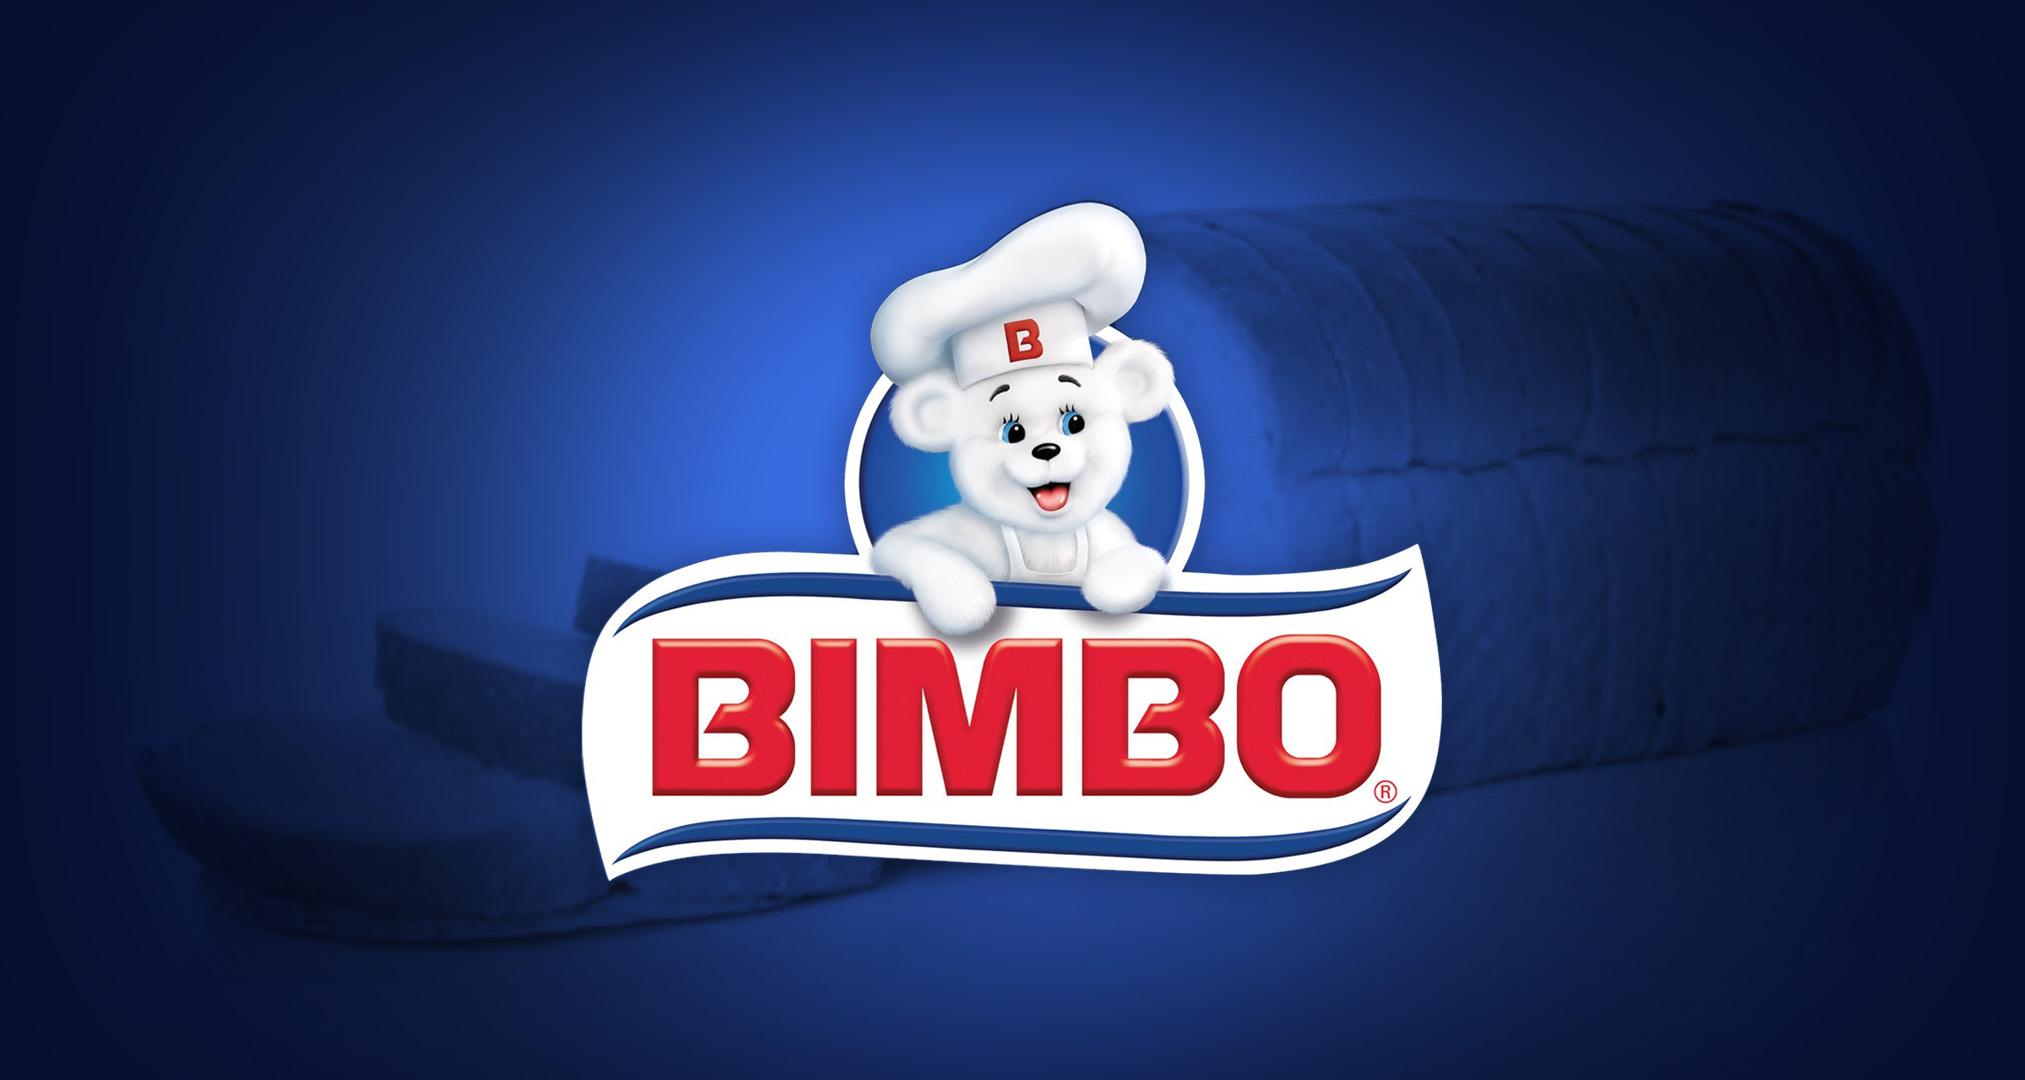 Historia de Bimbo